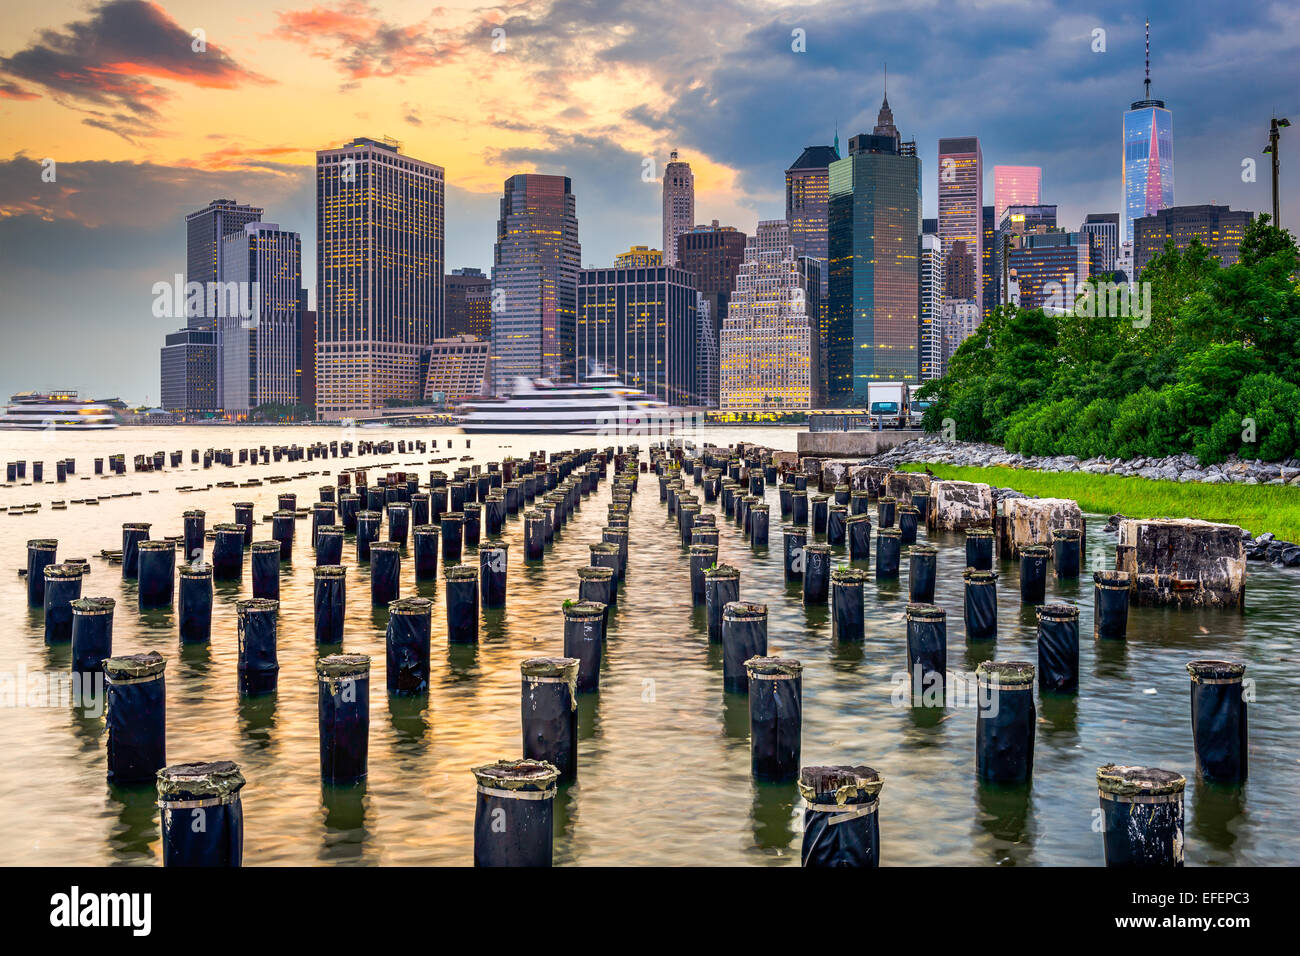 New York City, USA city skyline on the East River. - Stock Image